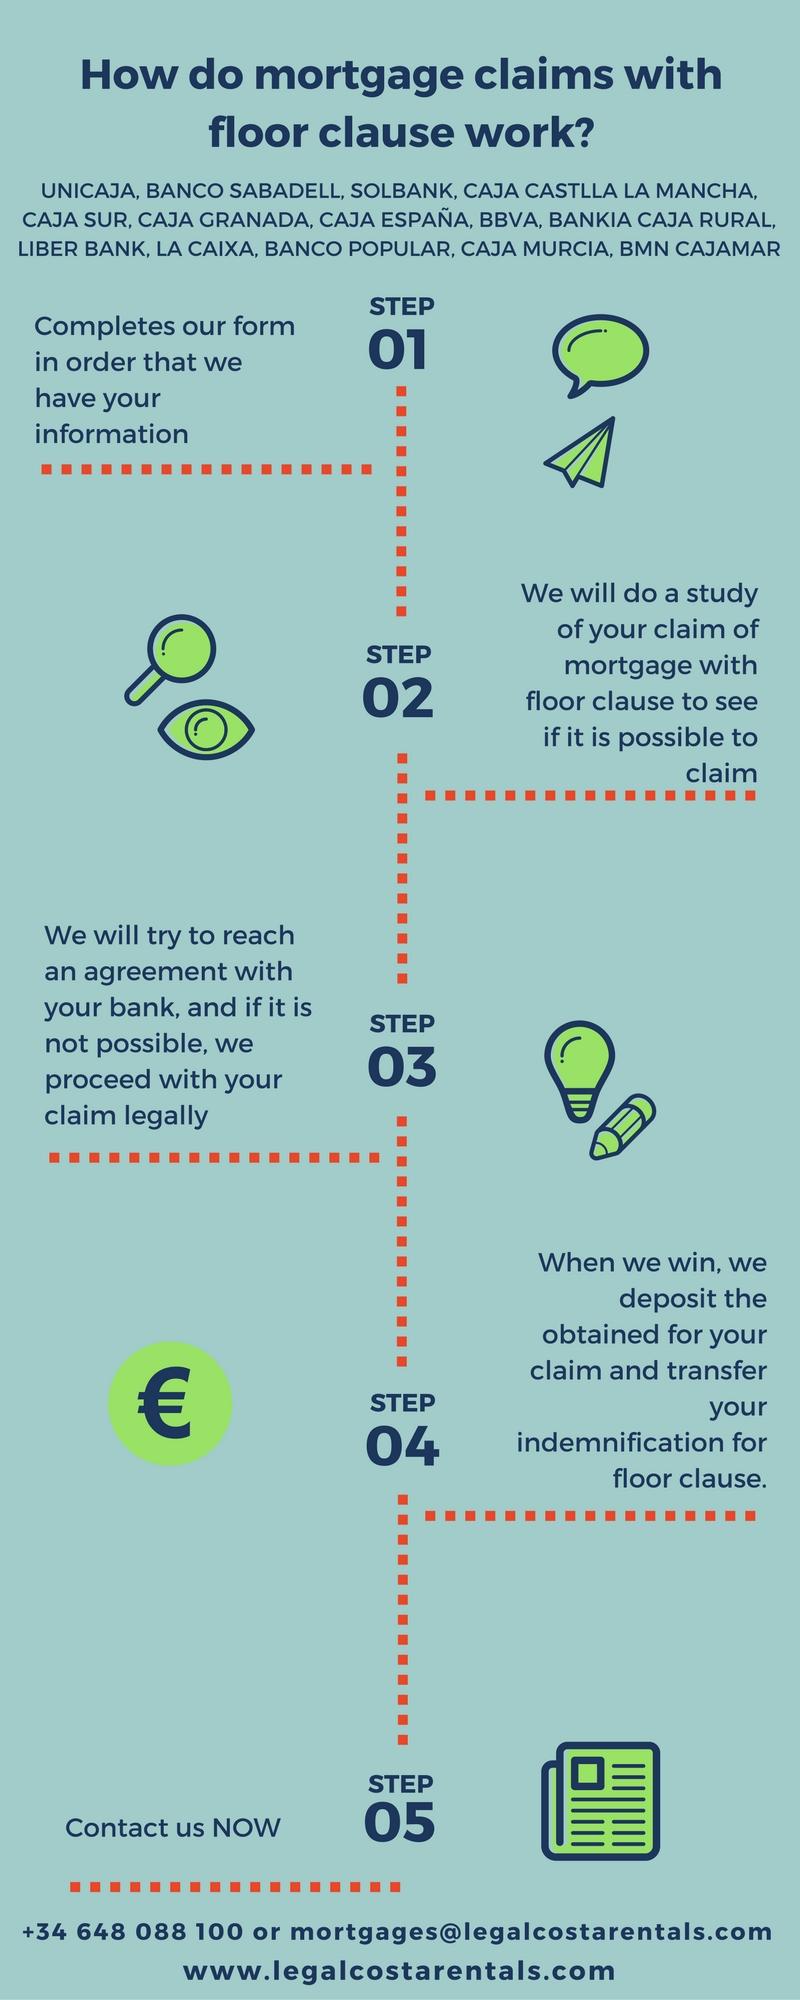 Legal Costa Rentals infographic